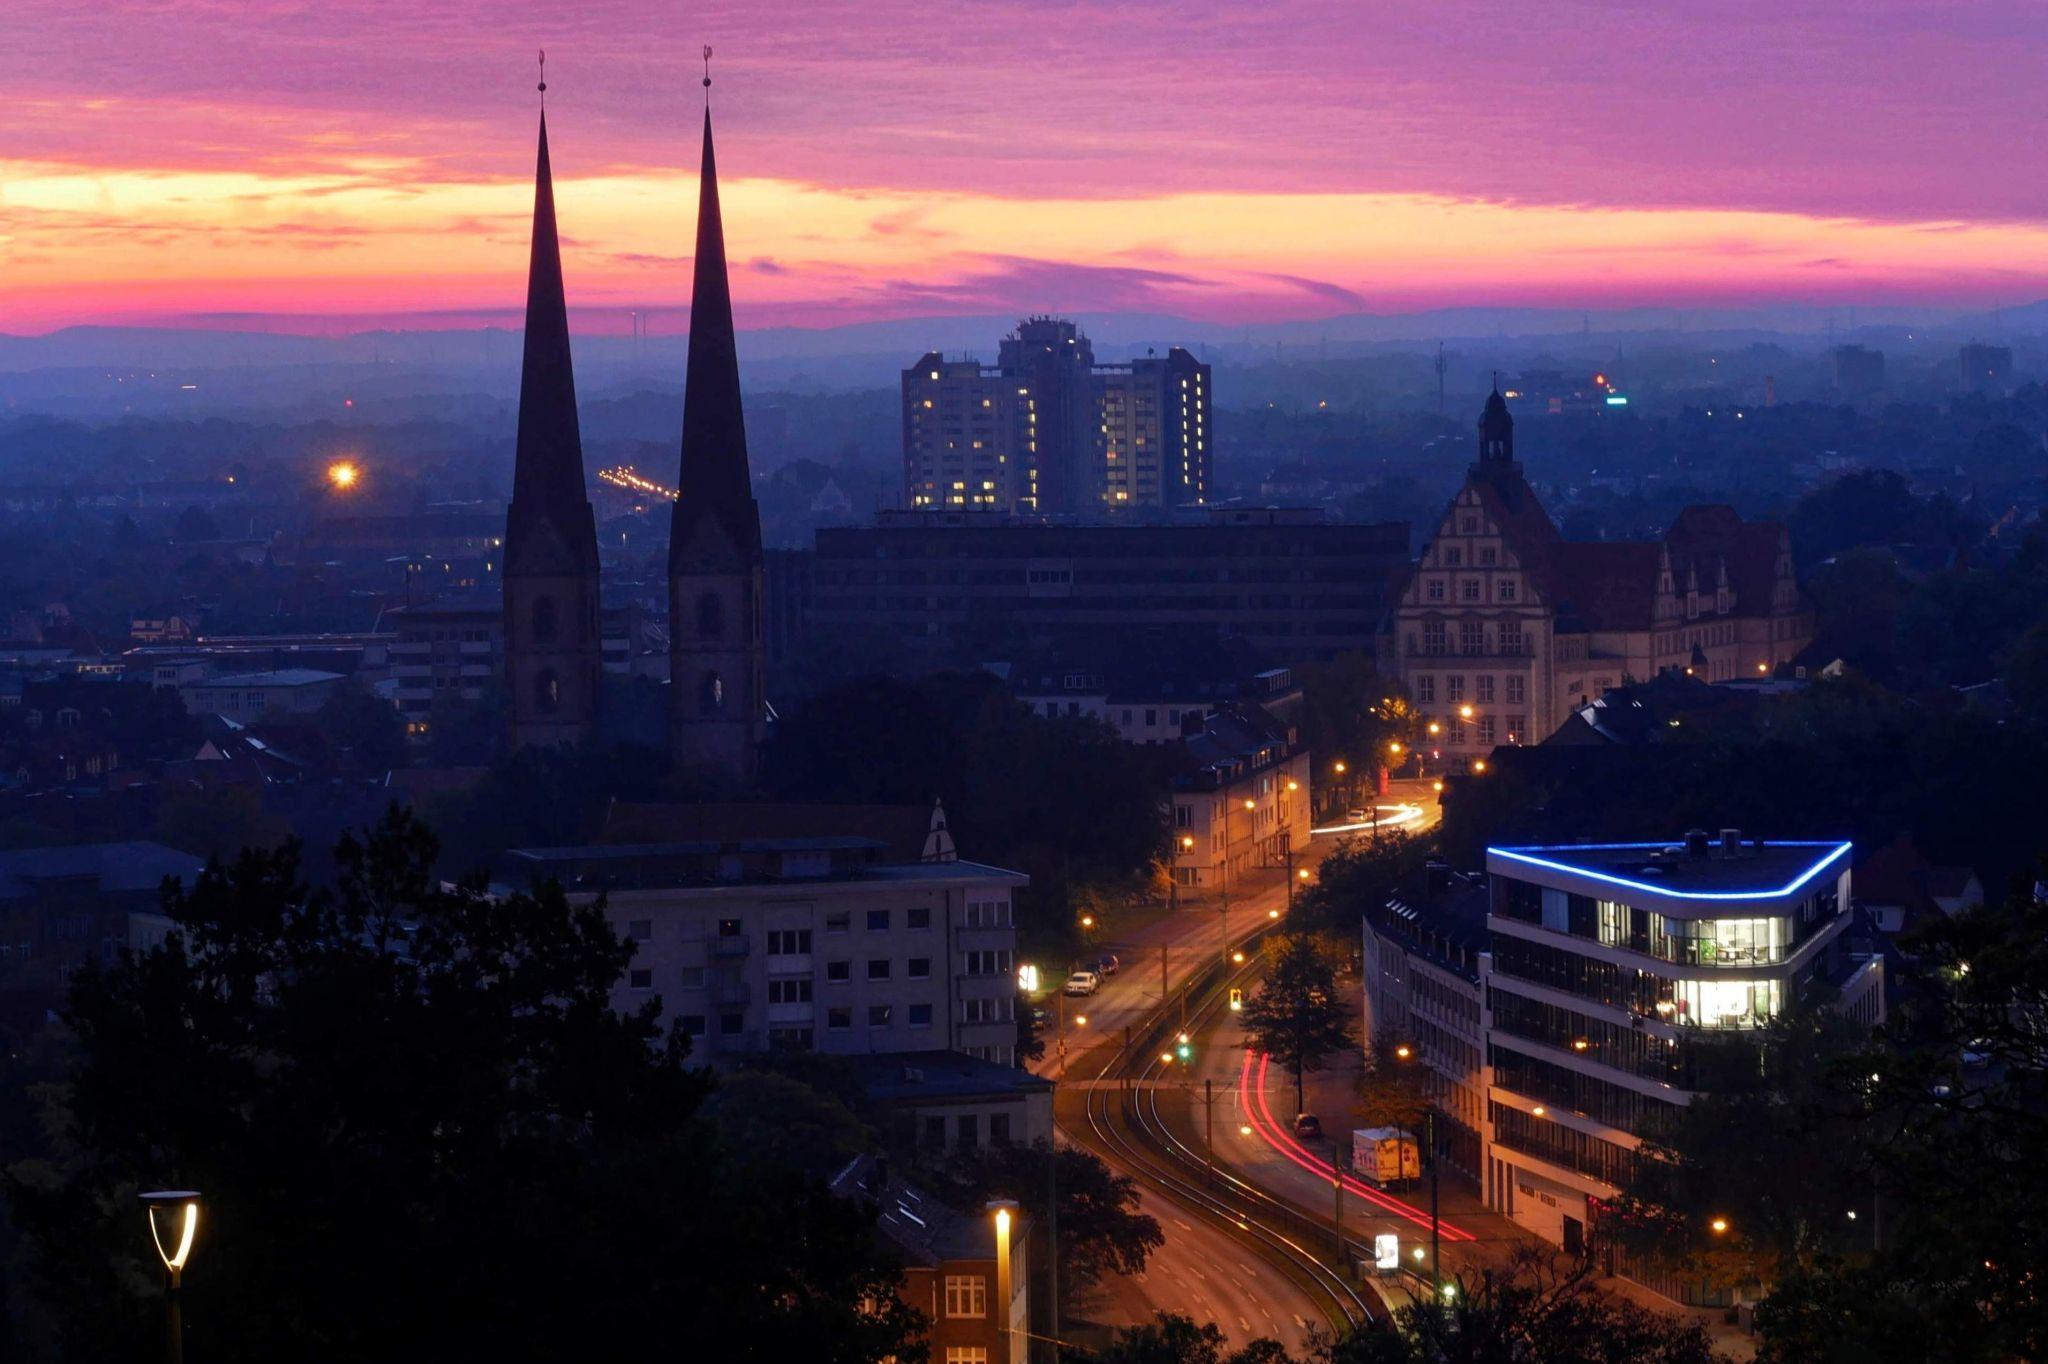 Bielefeld Aussicht Johannisberg, Germany